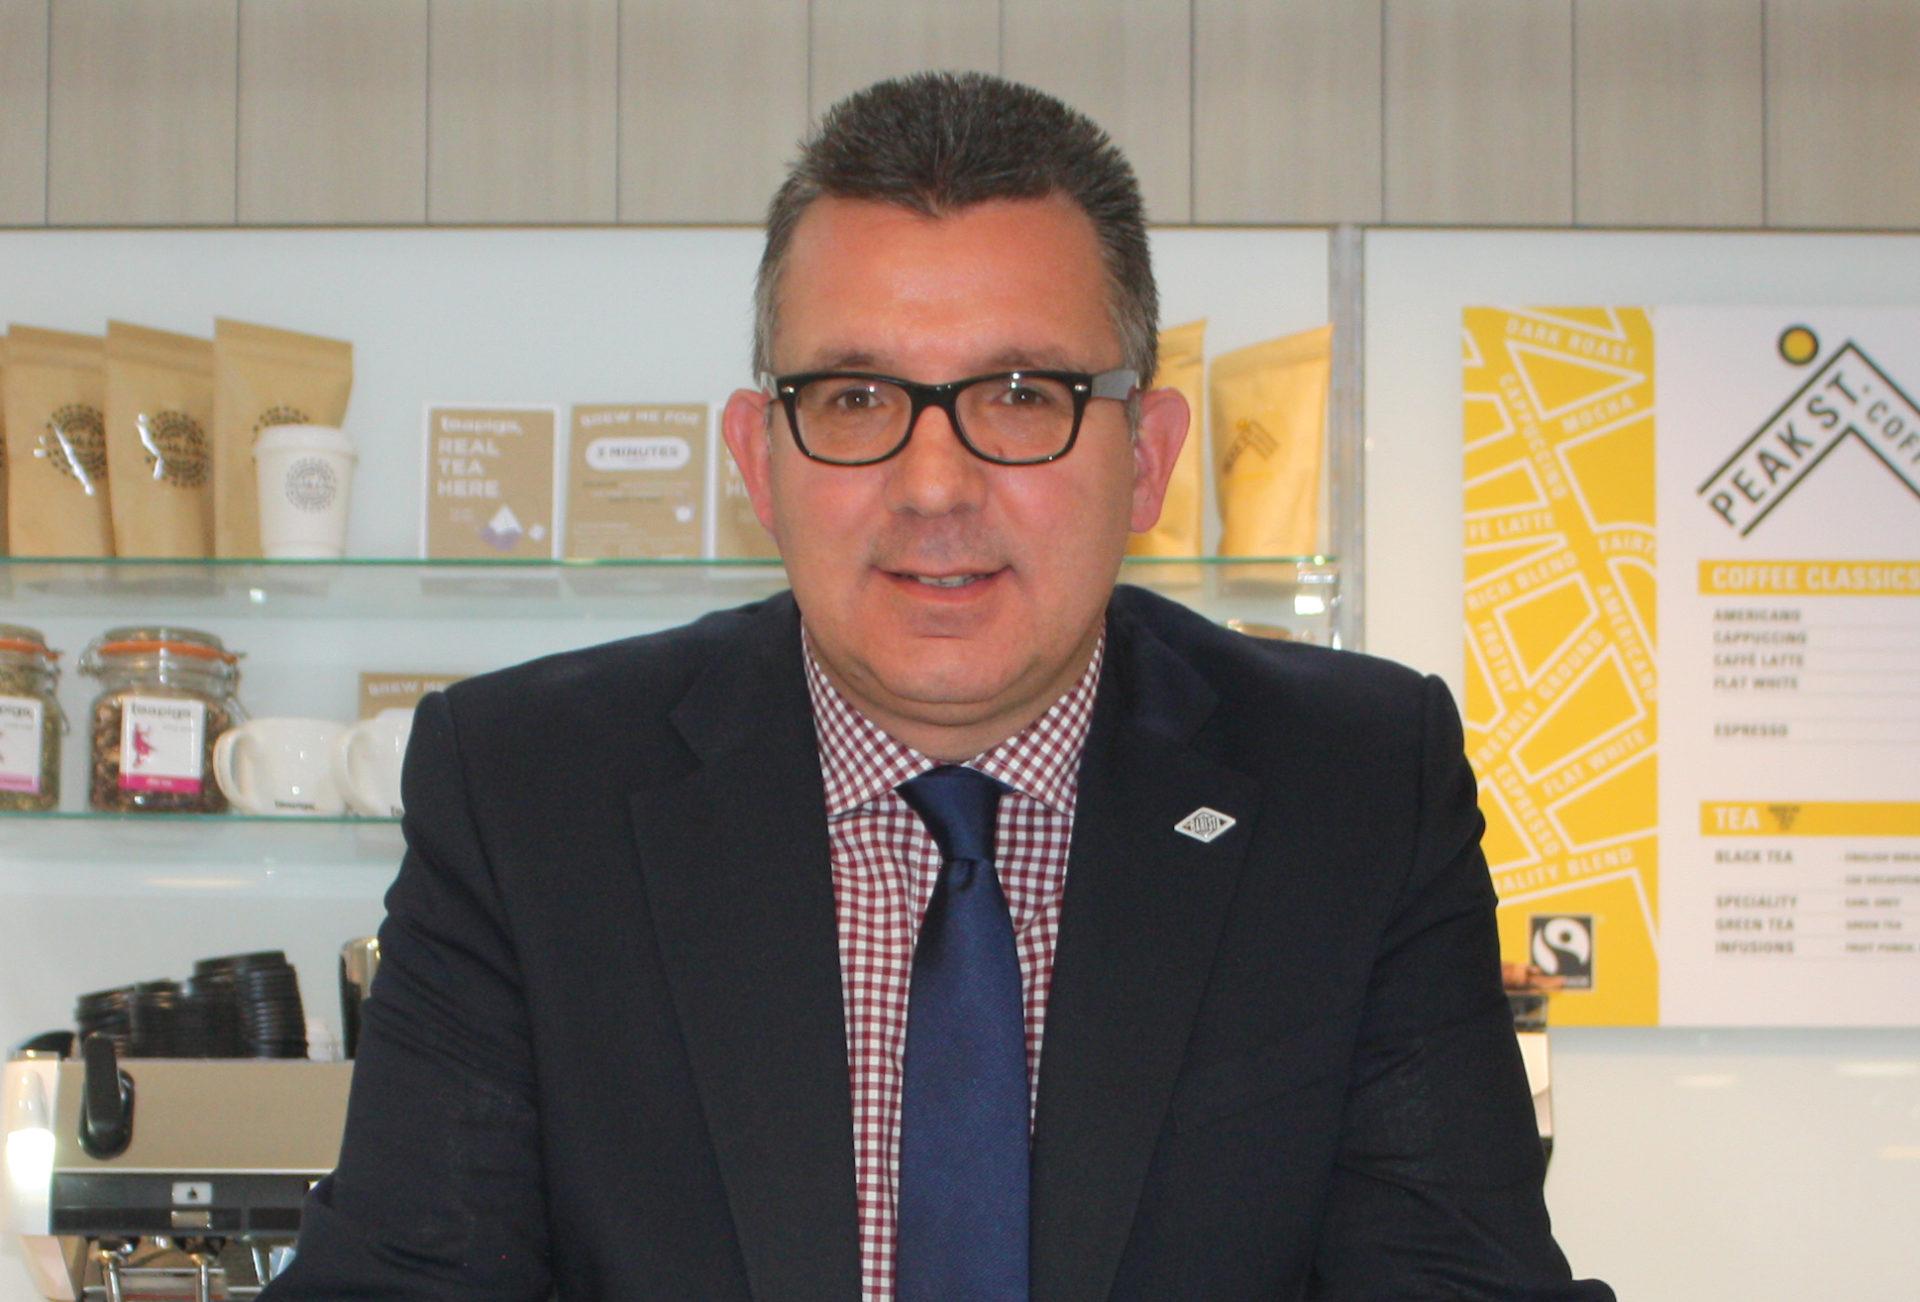 Steve Lovegrove, sales director